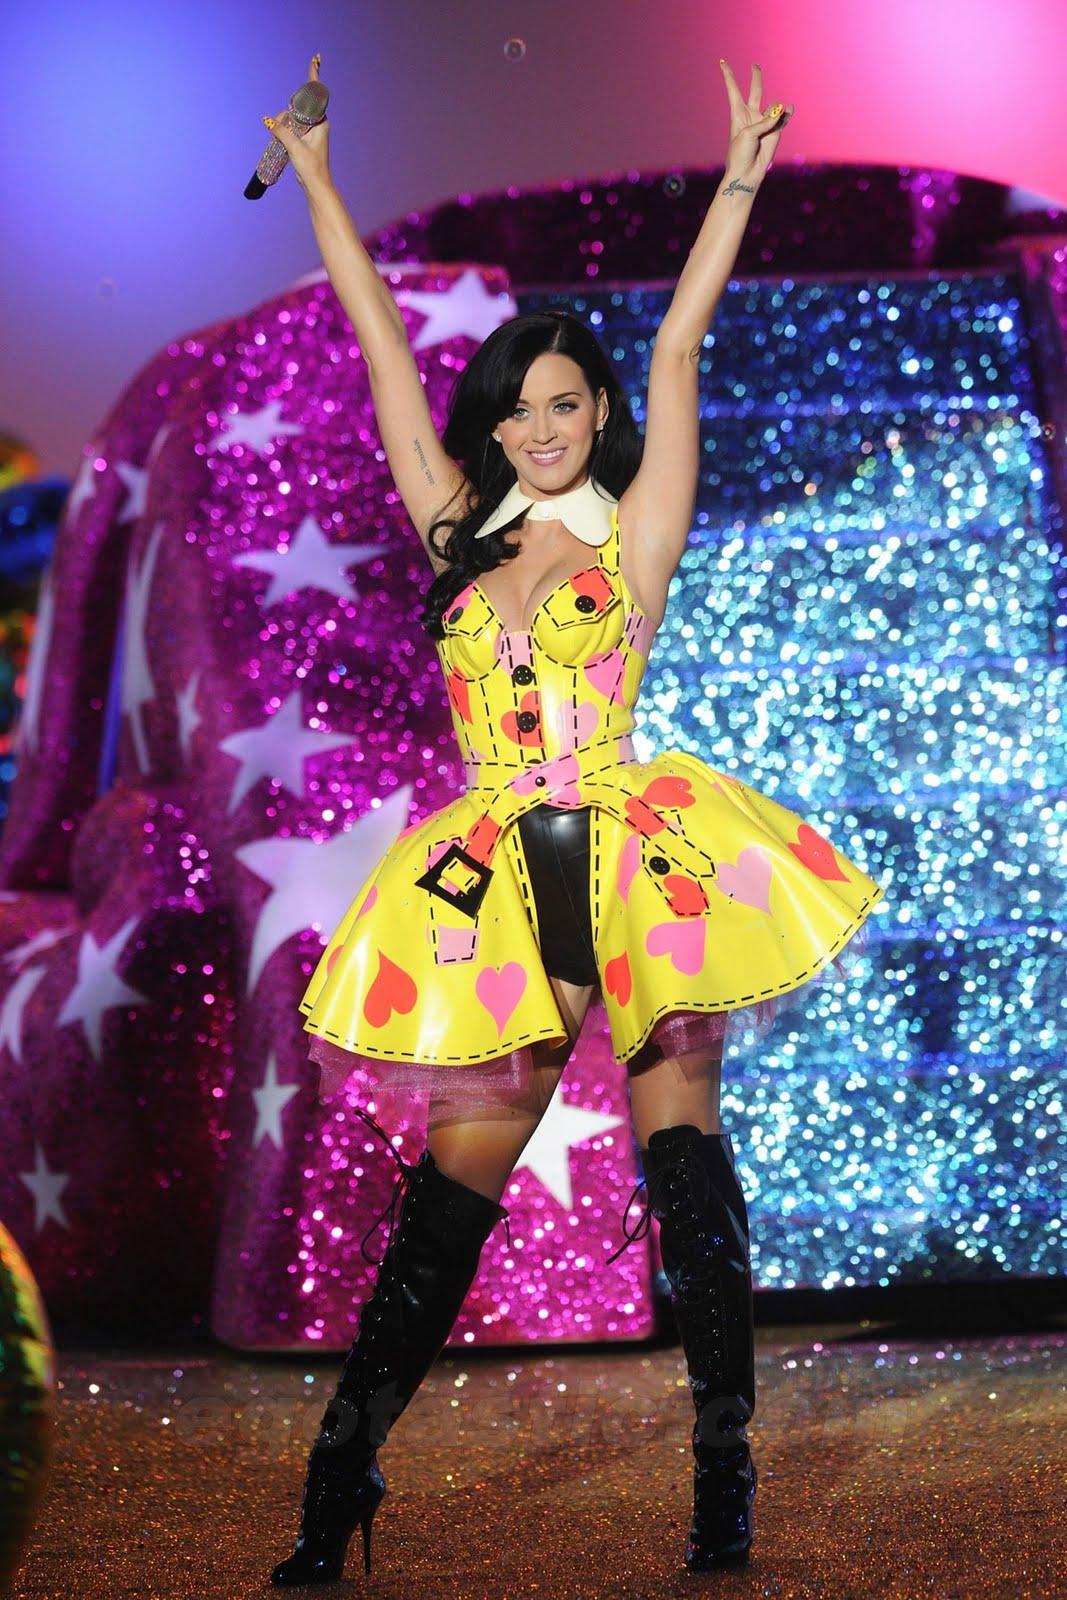 http://1.bp.blogspot.com/_O0zeIx3VKs4/TSrS_Wrzm5I/AAAAAAAAA7k/SpazAuEDyNs/s1600/katy-perry-2010-victorias-secret-fashion-show-03.jpg